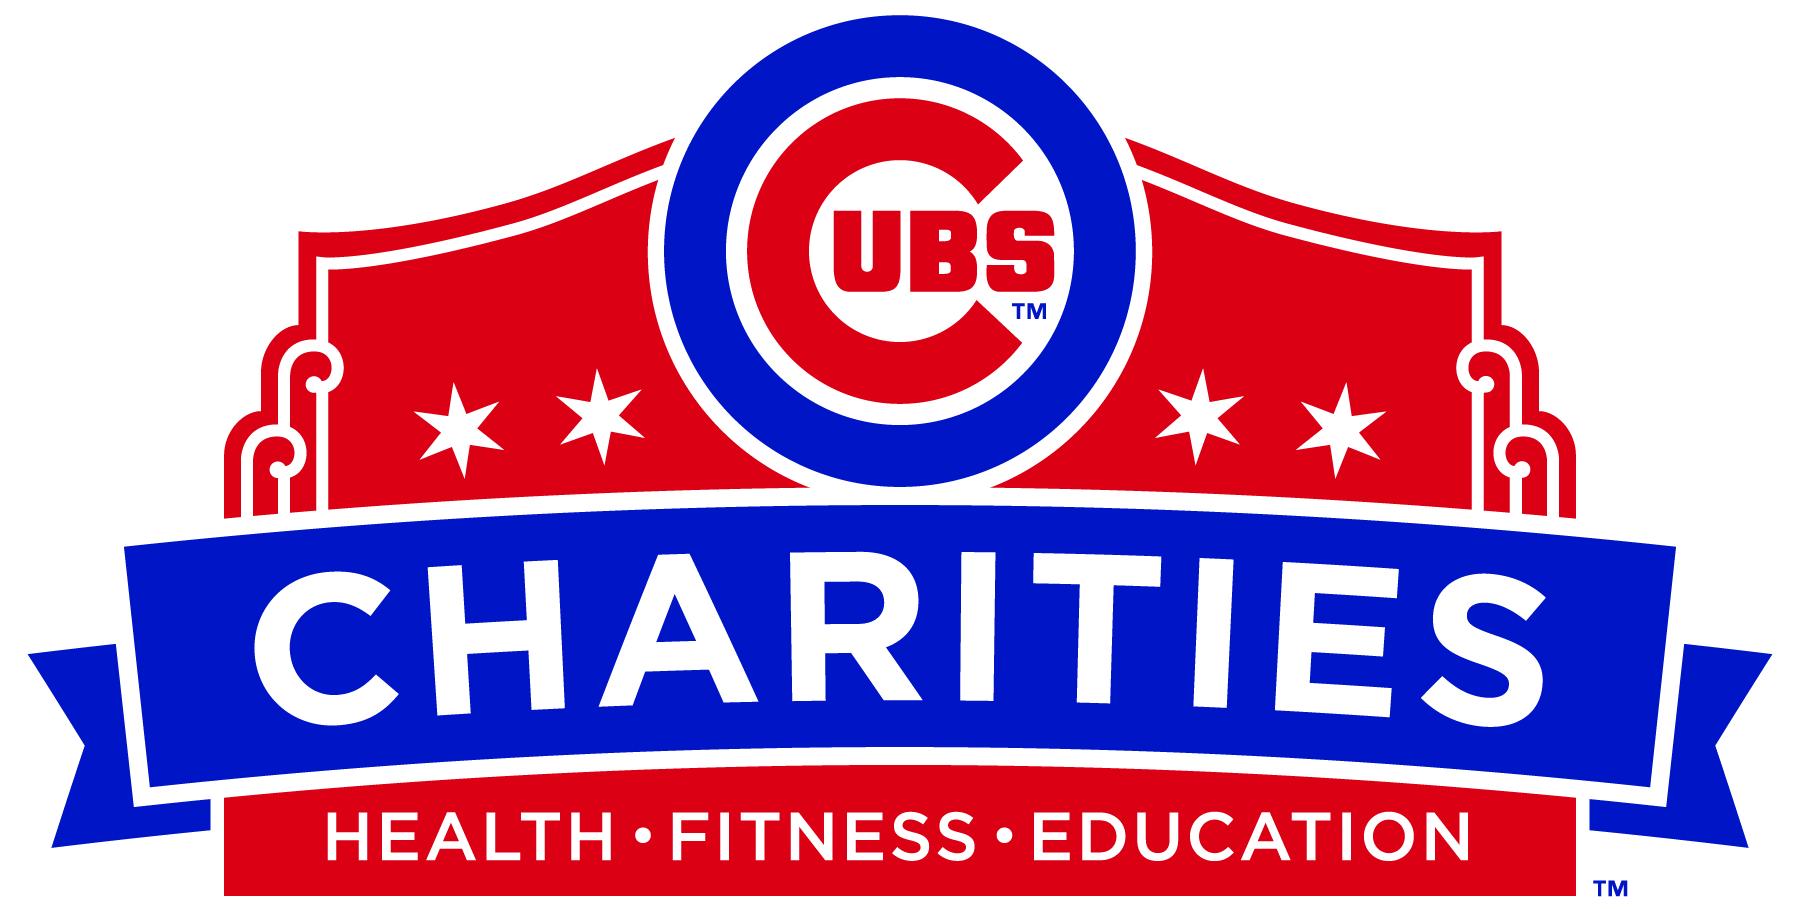 Cubs_Charities_Logo_Color.jpg